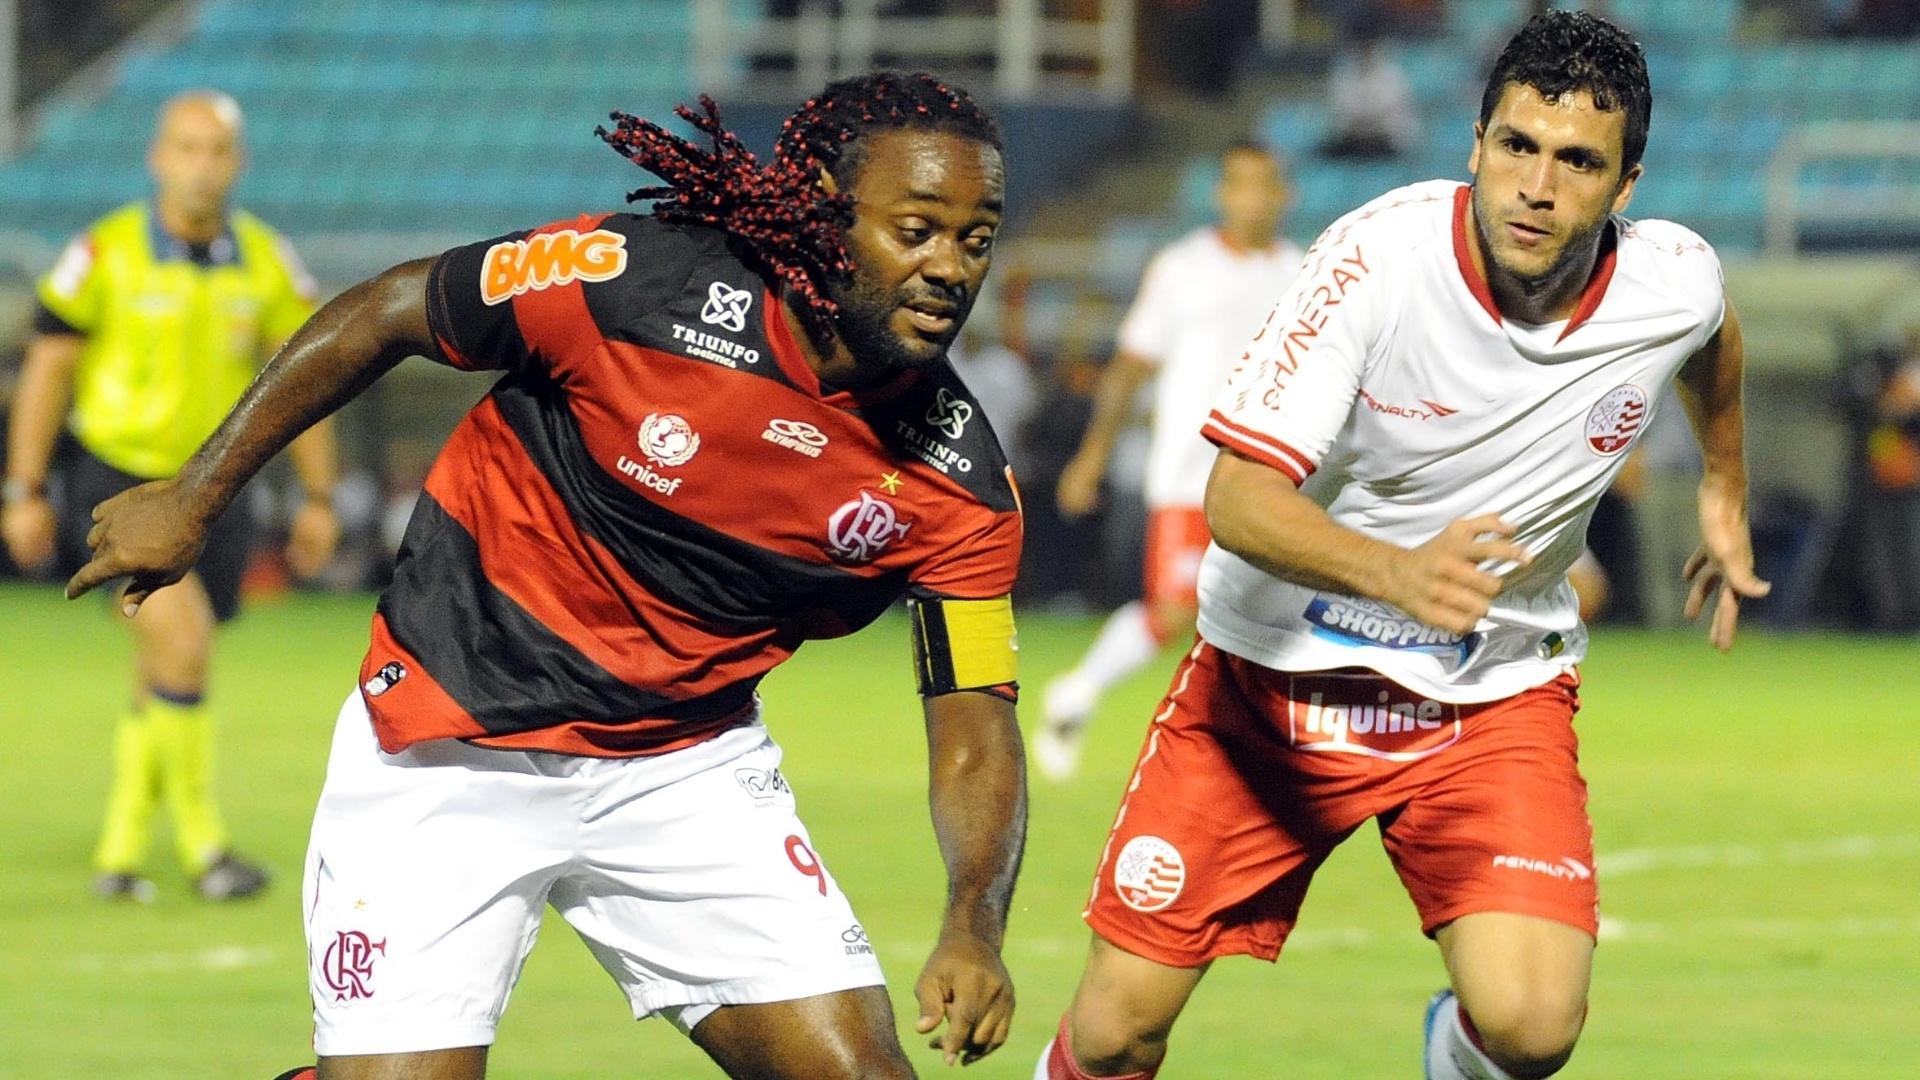 Flamengo, de Love, foi superior ao Náutico na primeira etapa